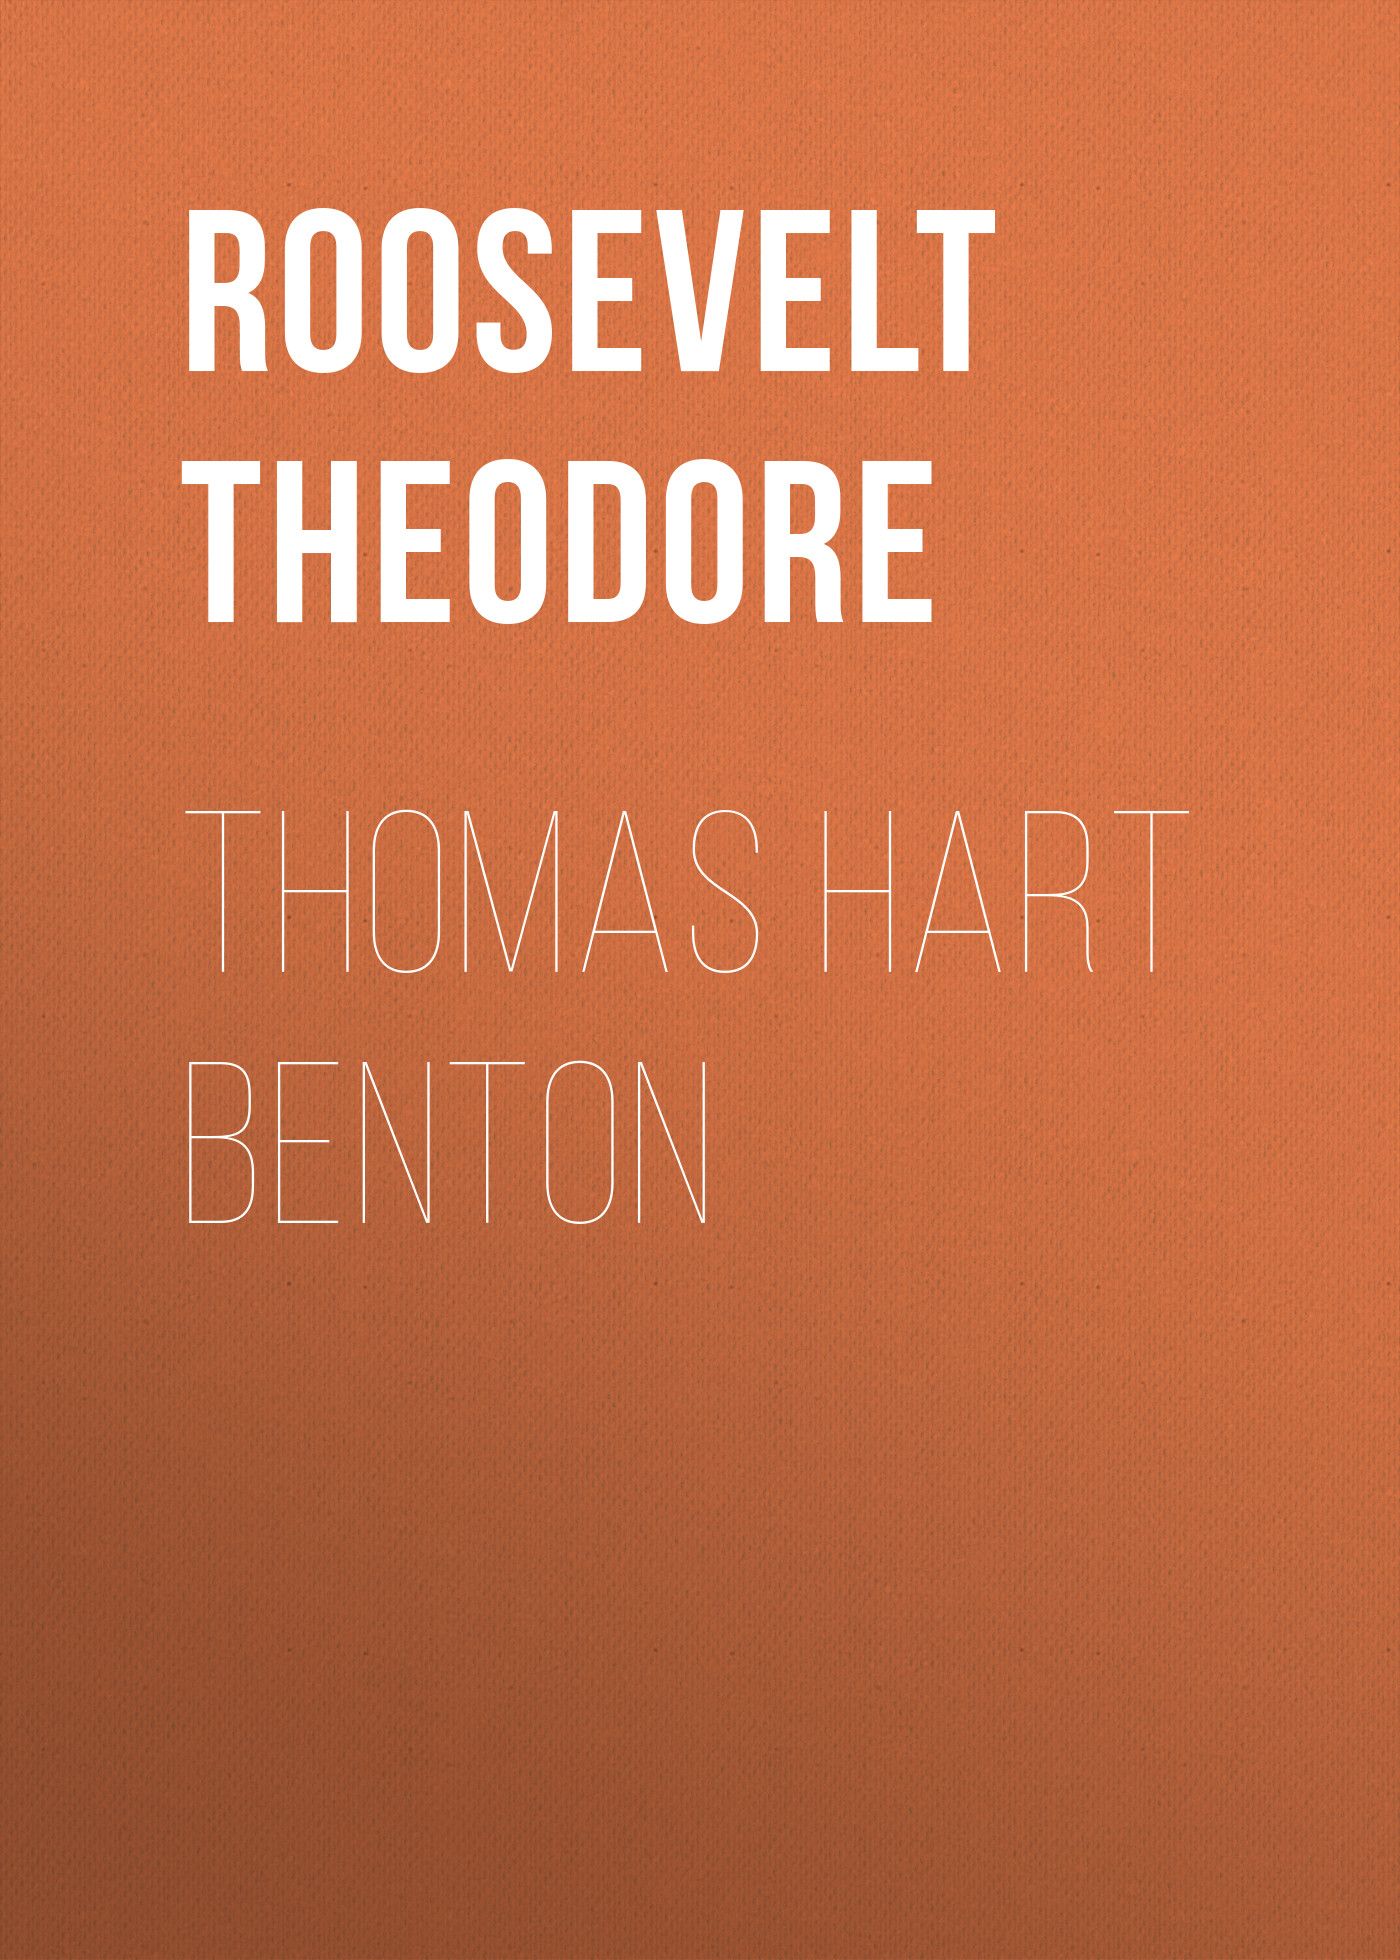 Roosevelt Theodore Thomas Hart Benton who was theodore roosevelt